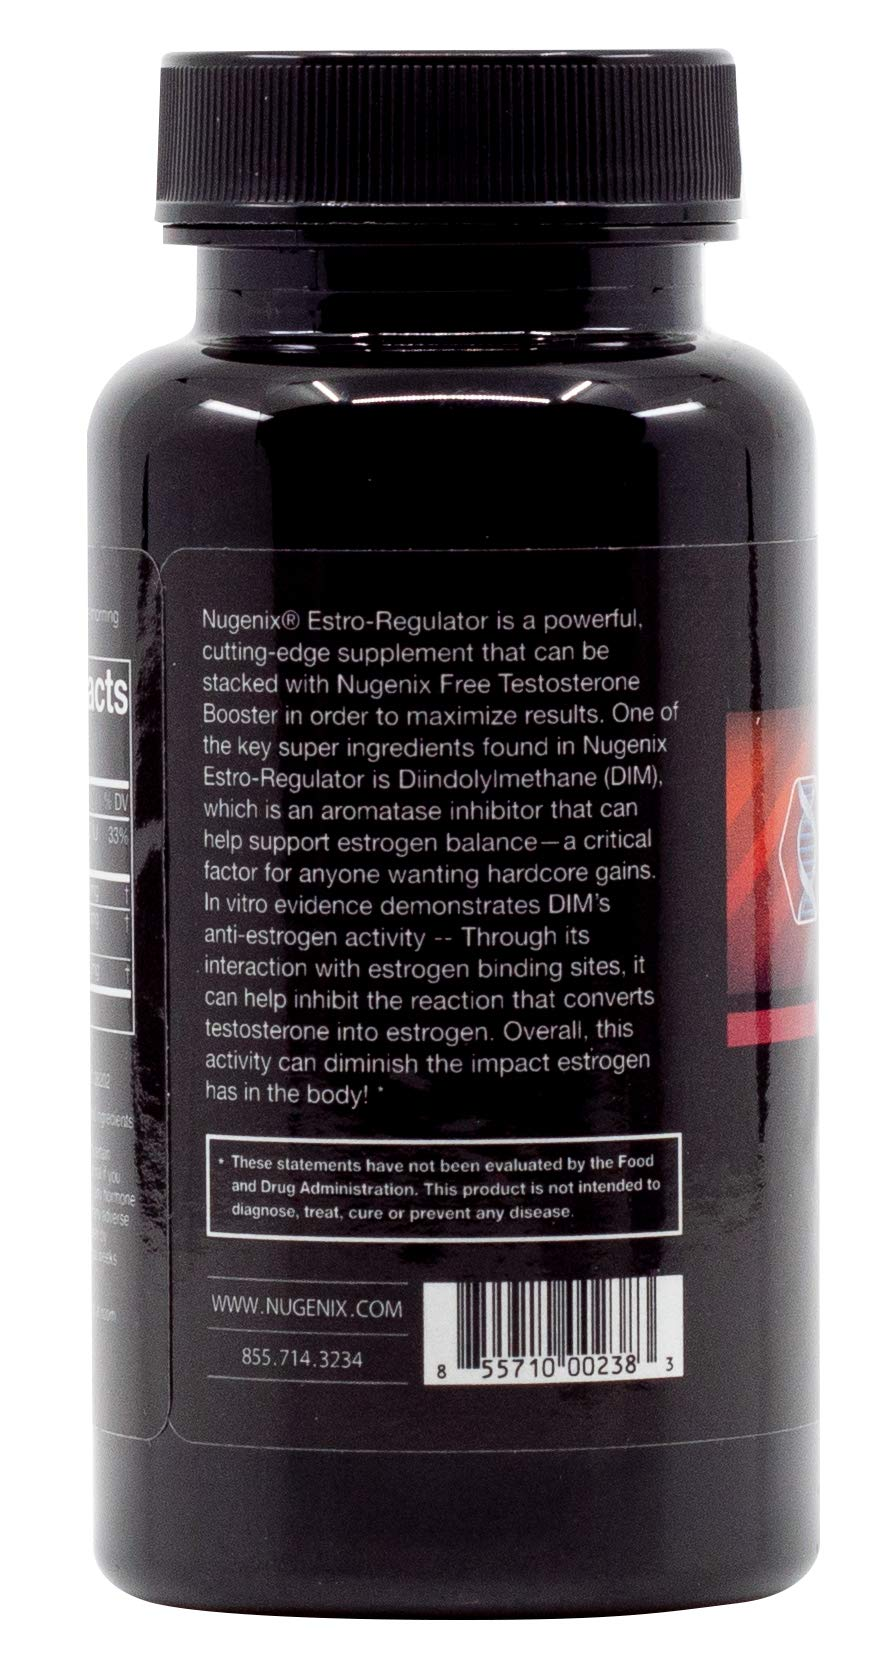 Nugenix Estro-Regulator - Power Estrogen Blocker, Boost Testosterone, Aromatase Inhibitor, DIM, Chrysin - 60 Capsules by Nugenix (Image #4)